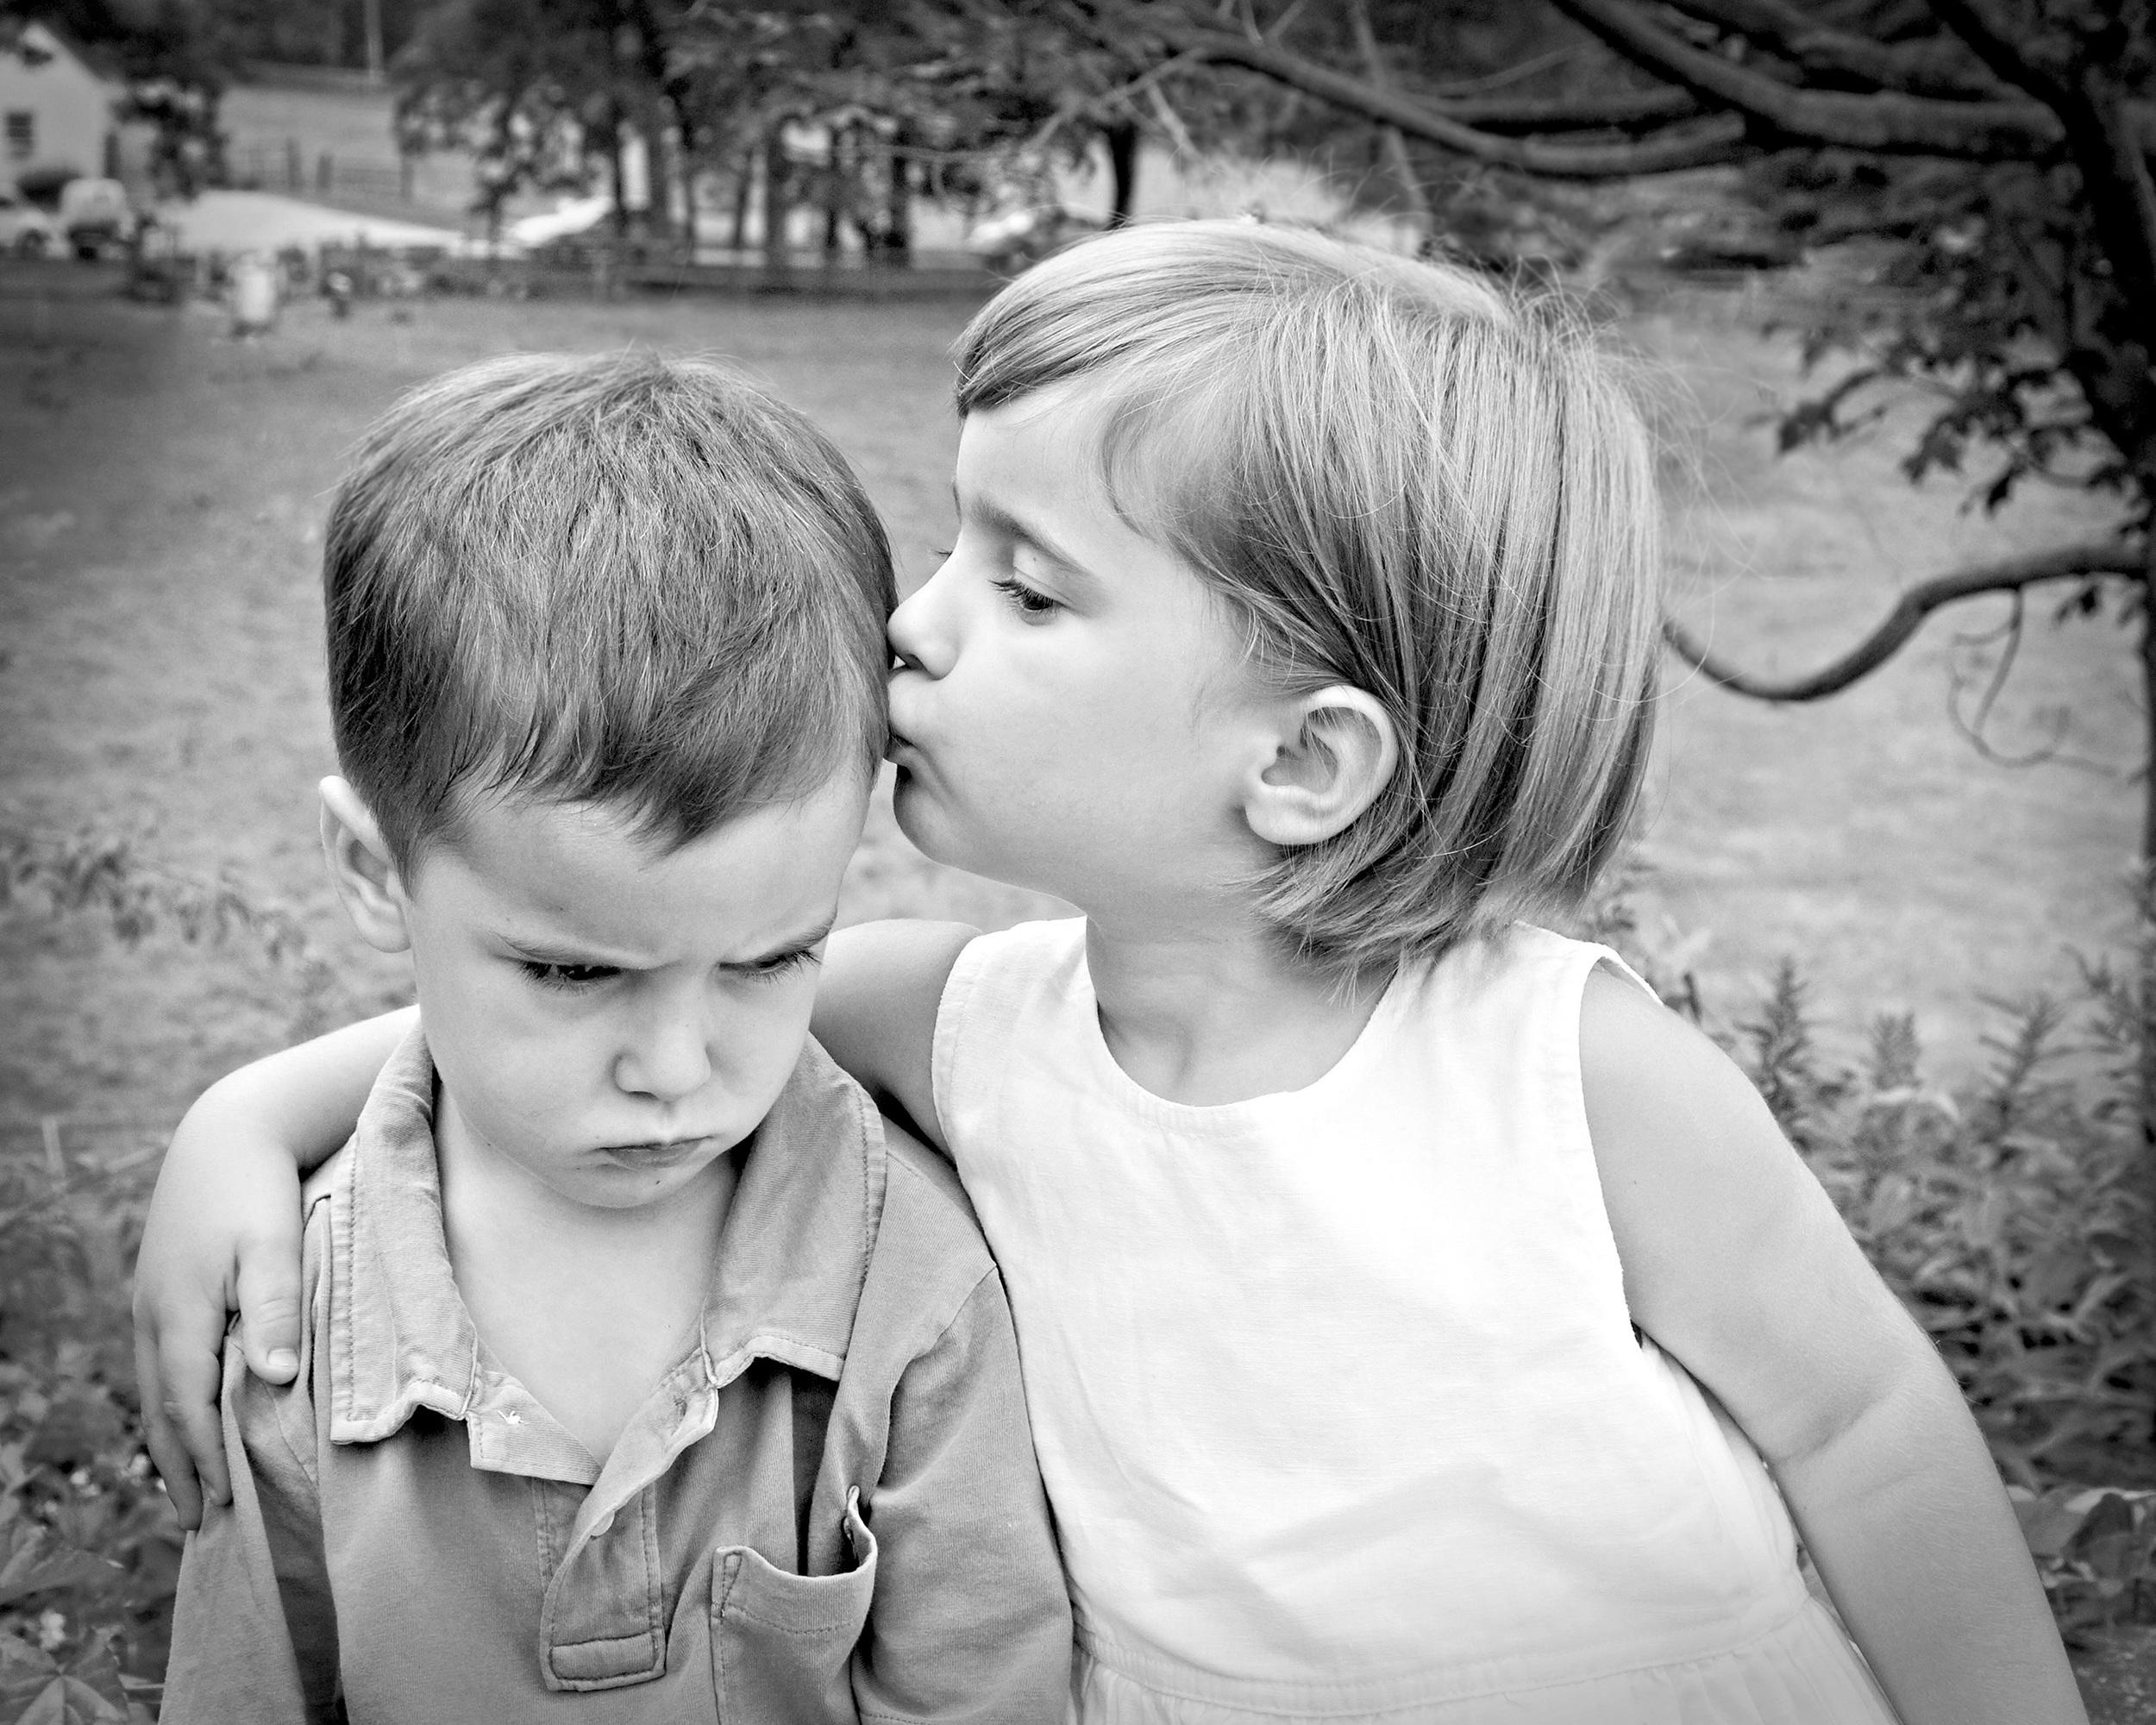 San Ramon Family Photographer ©ninapomeroy.com siblings children families